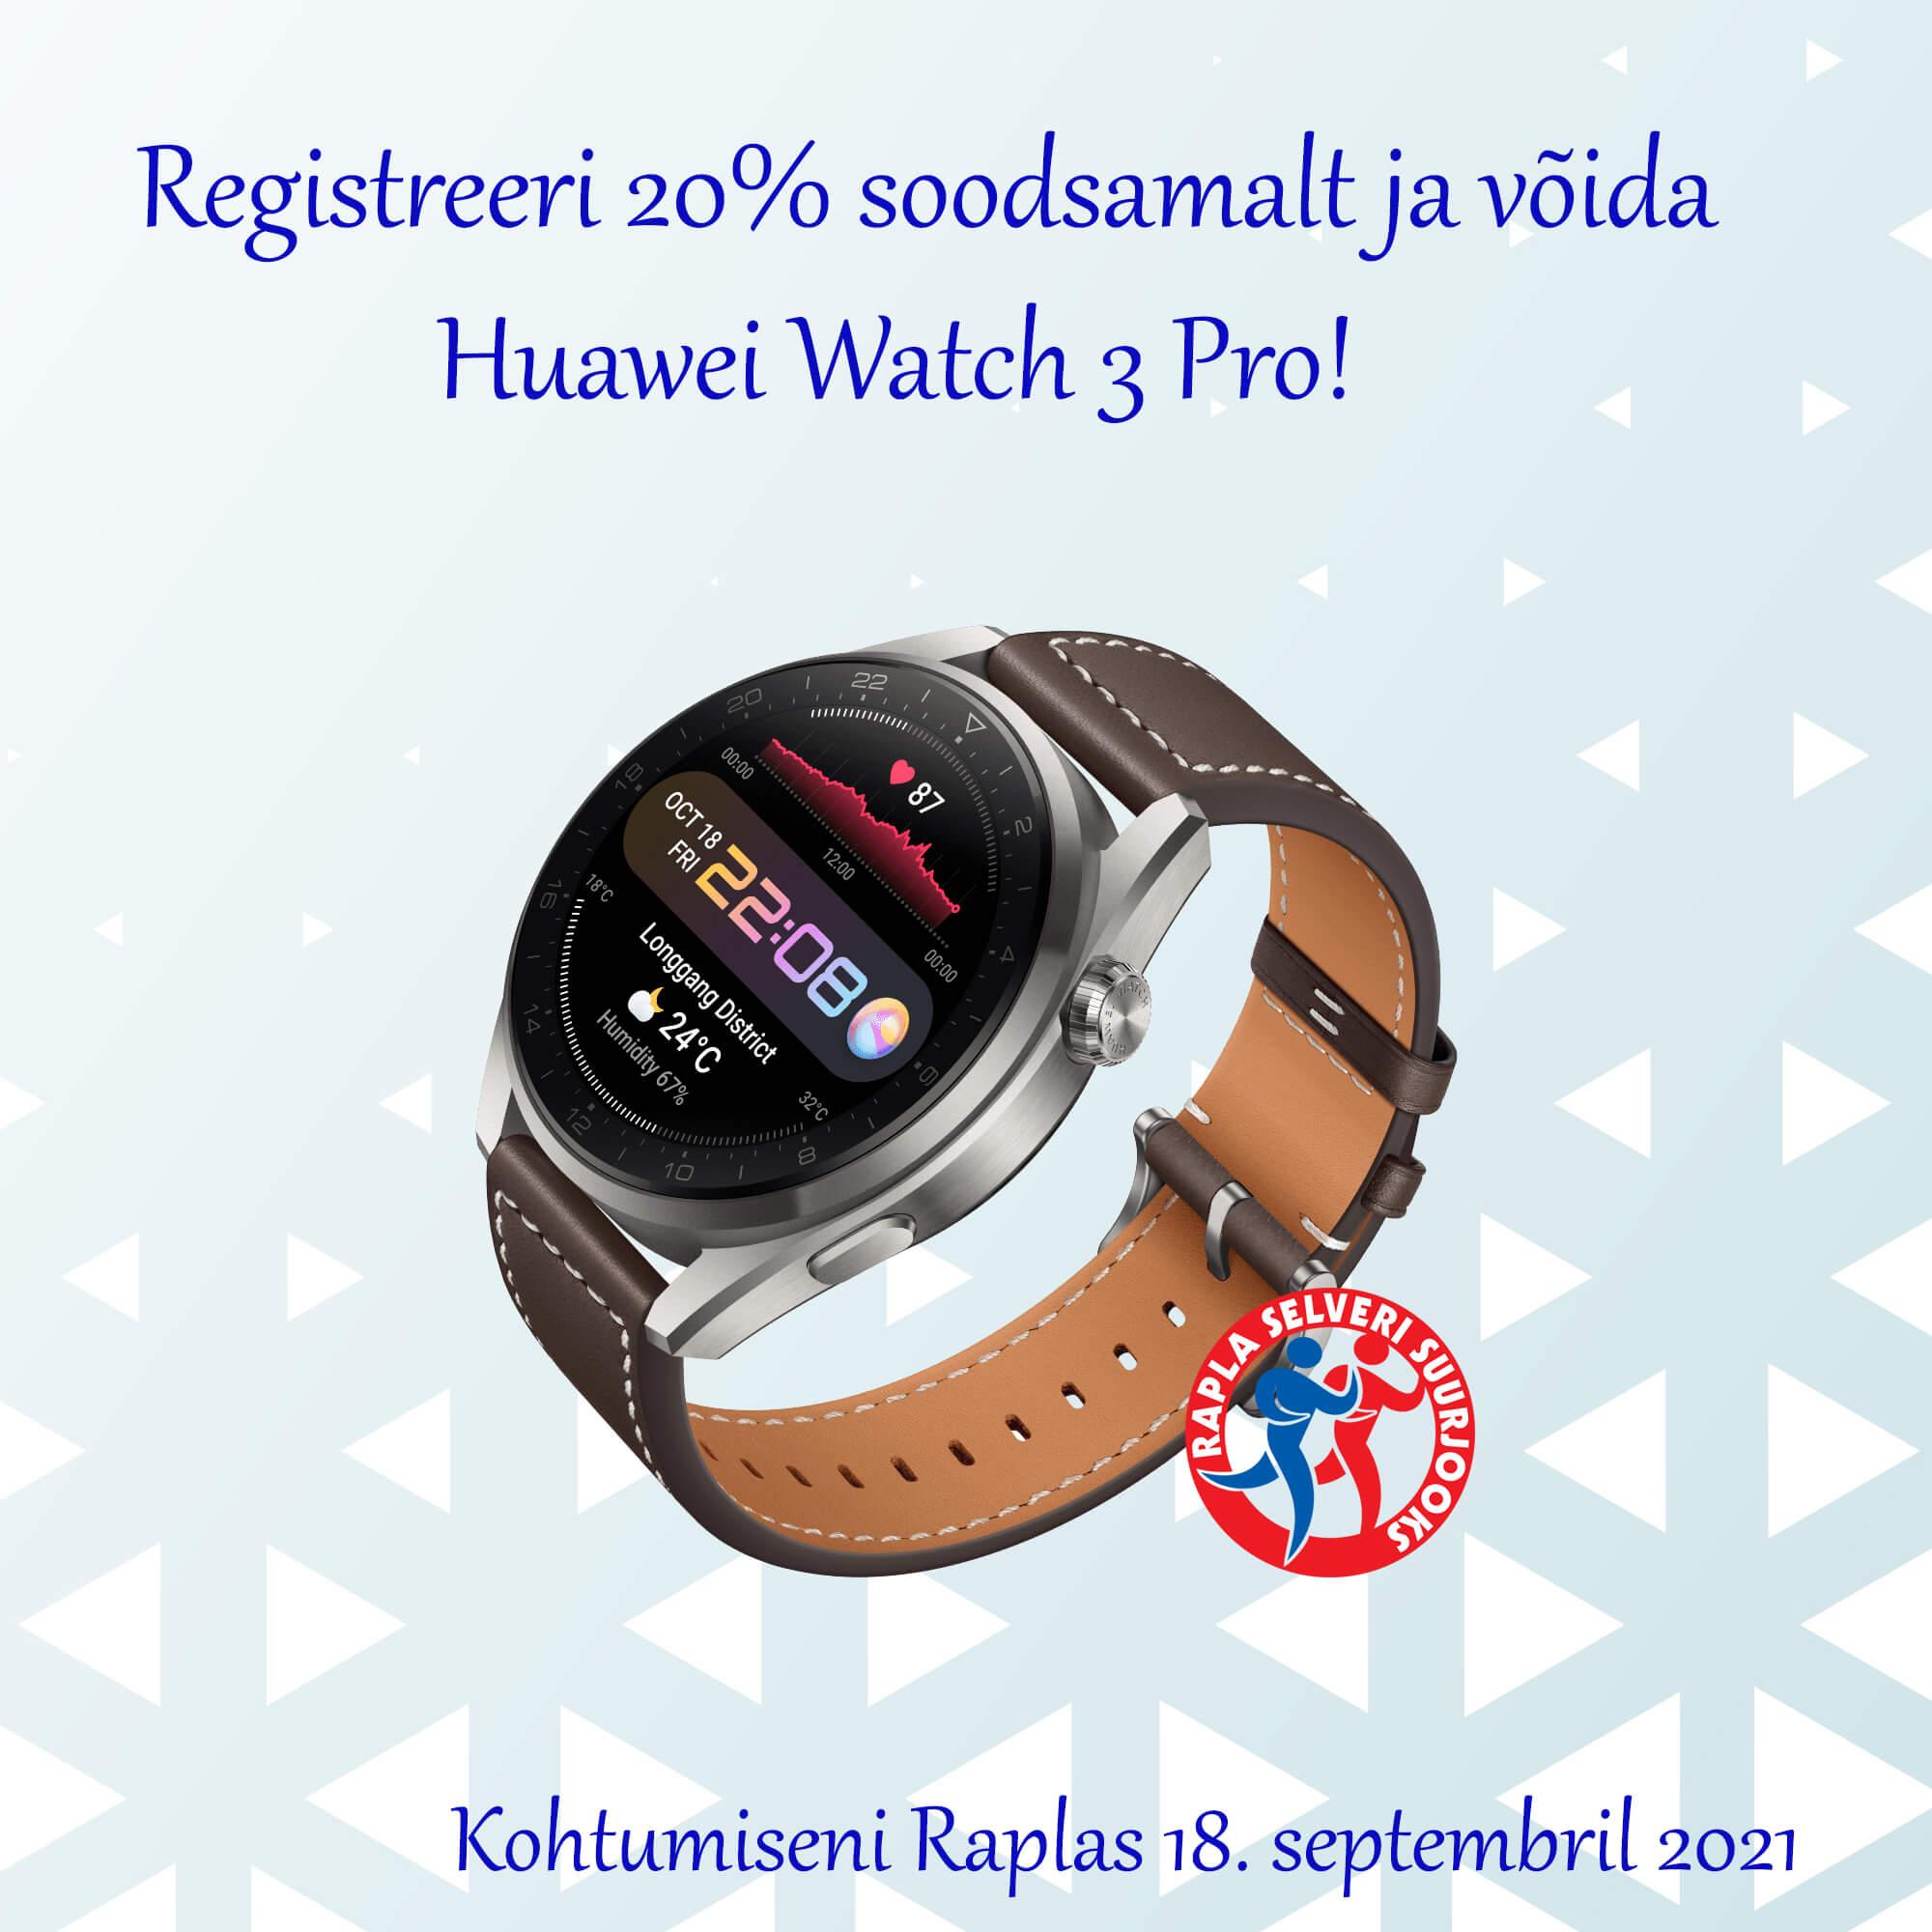 VÕIDA HUAWEI WATCH 3 PRO NUTIKELL!